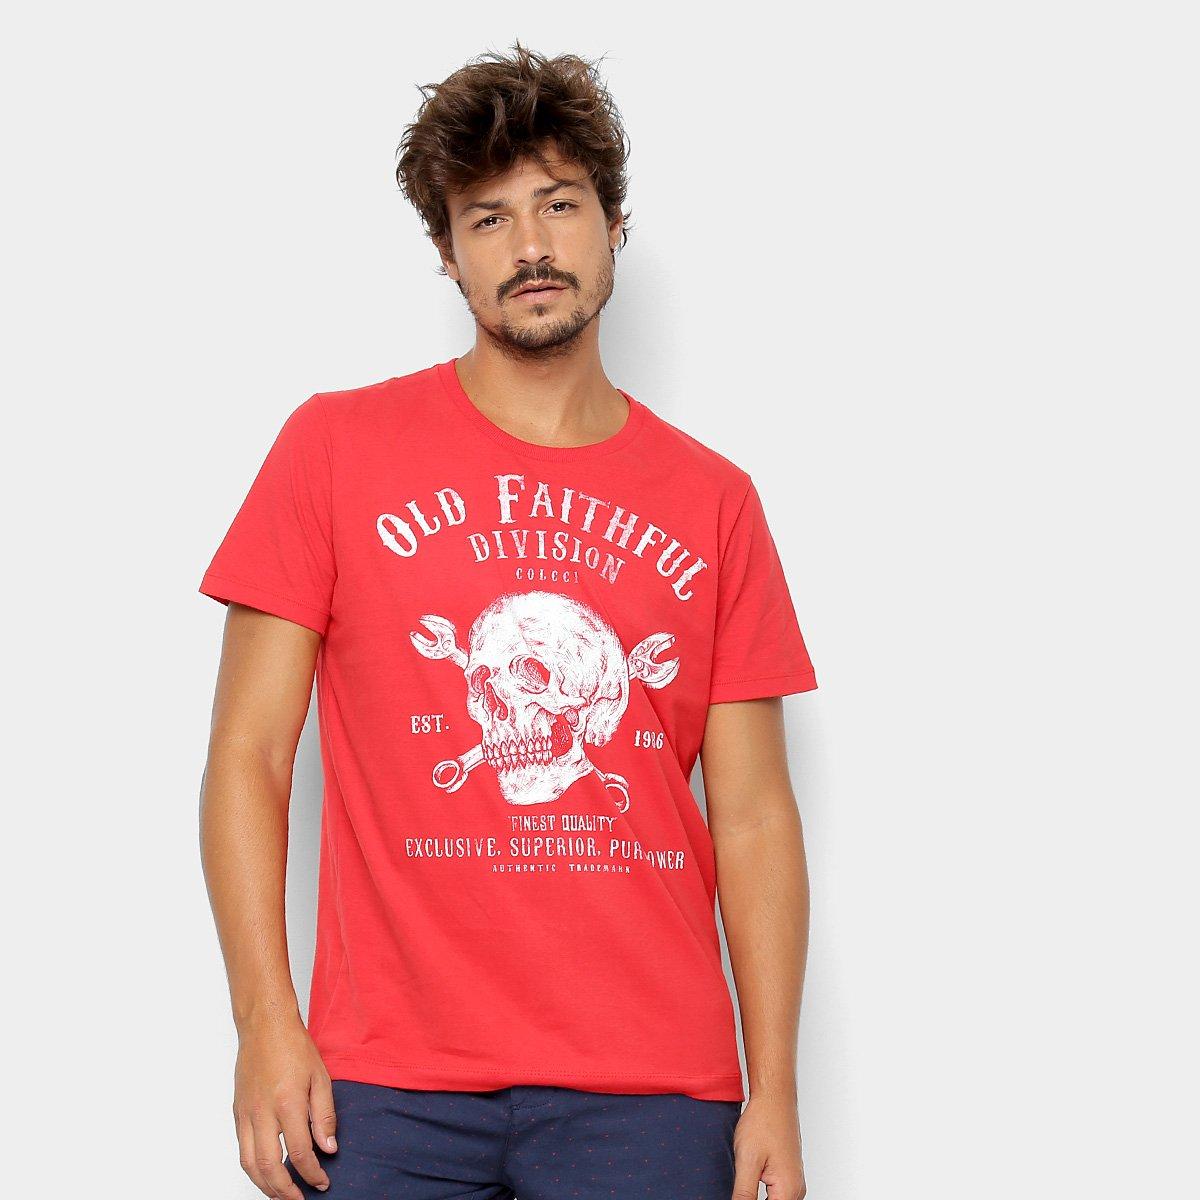 9b9d1109a Camiseta Colcci Caveira Masculina - Shopping TudoAzul